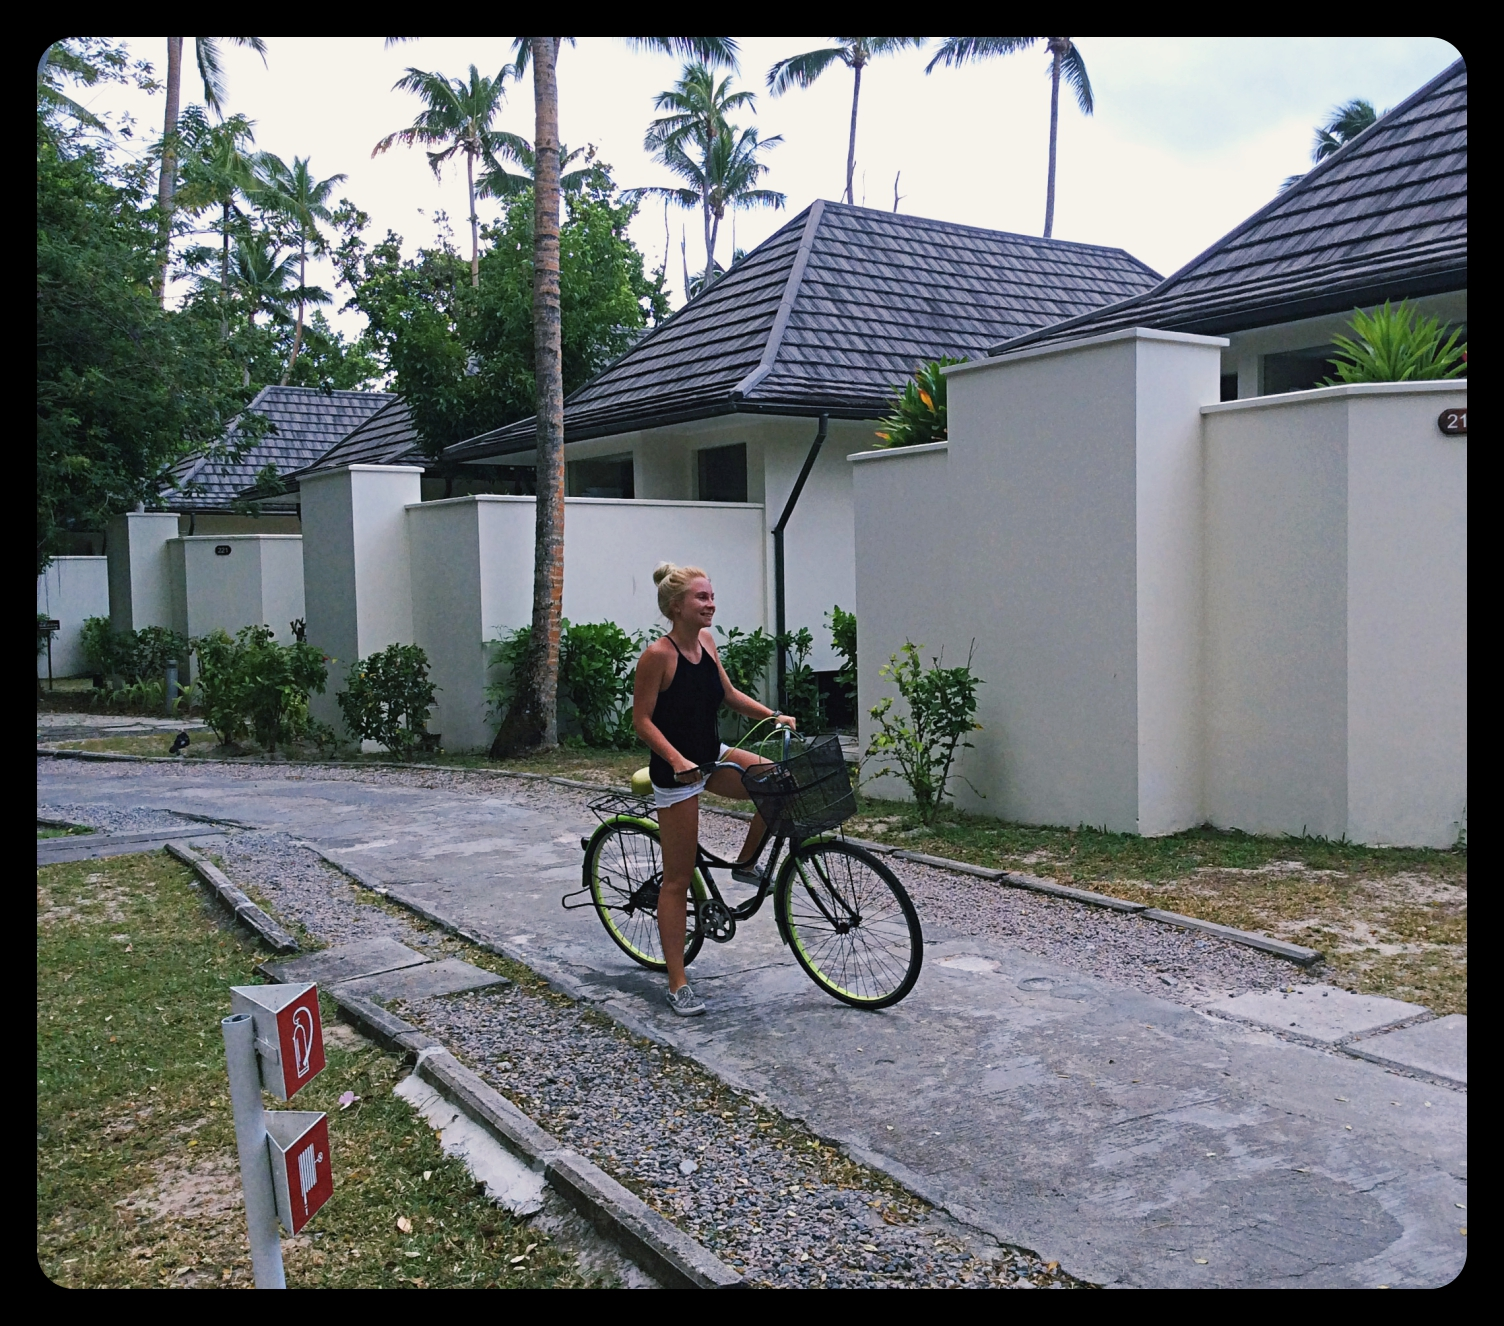 hilton_bike_altertonative.JPG